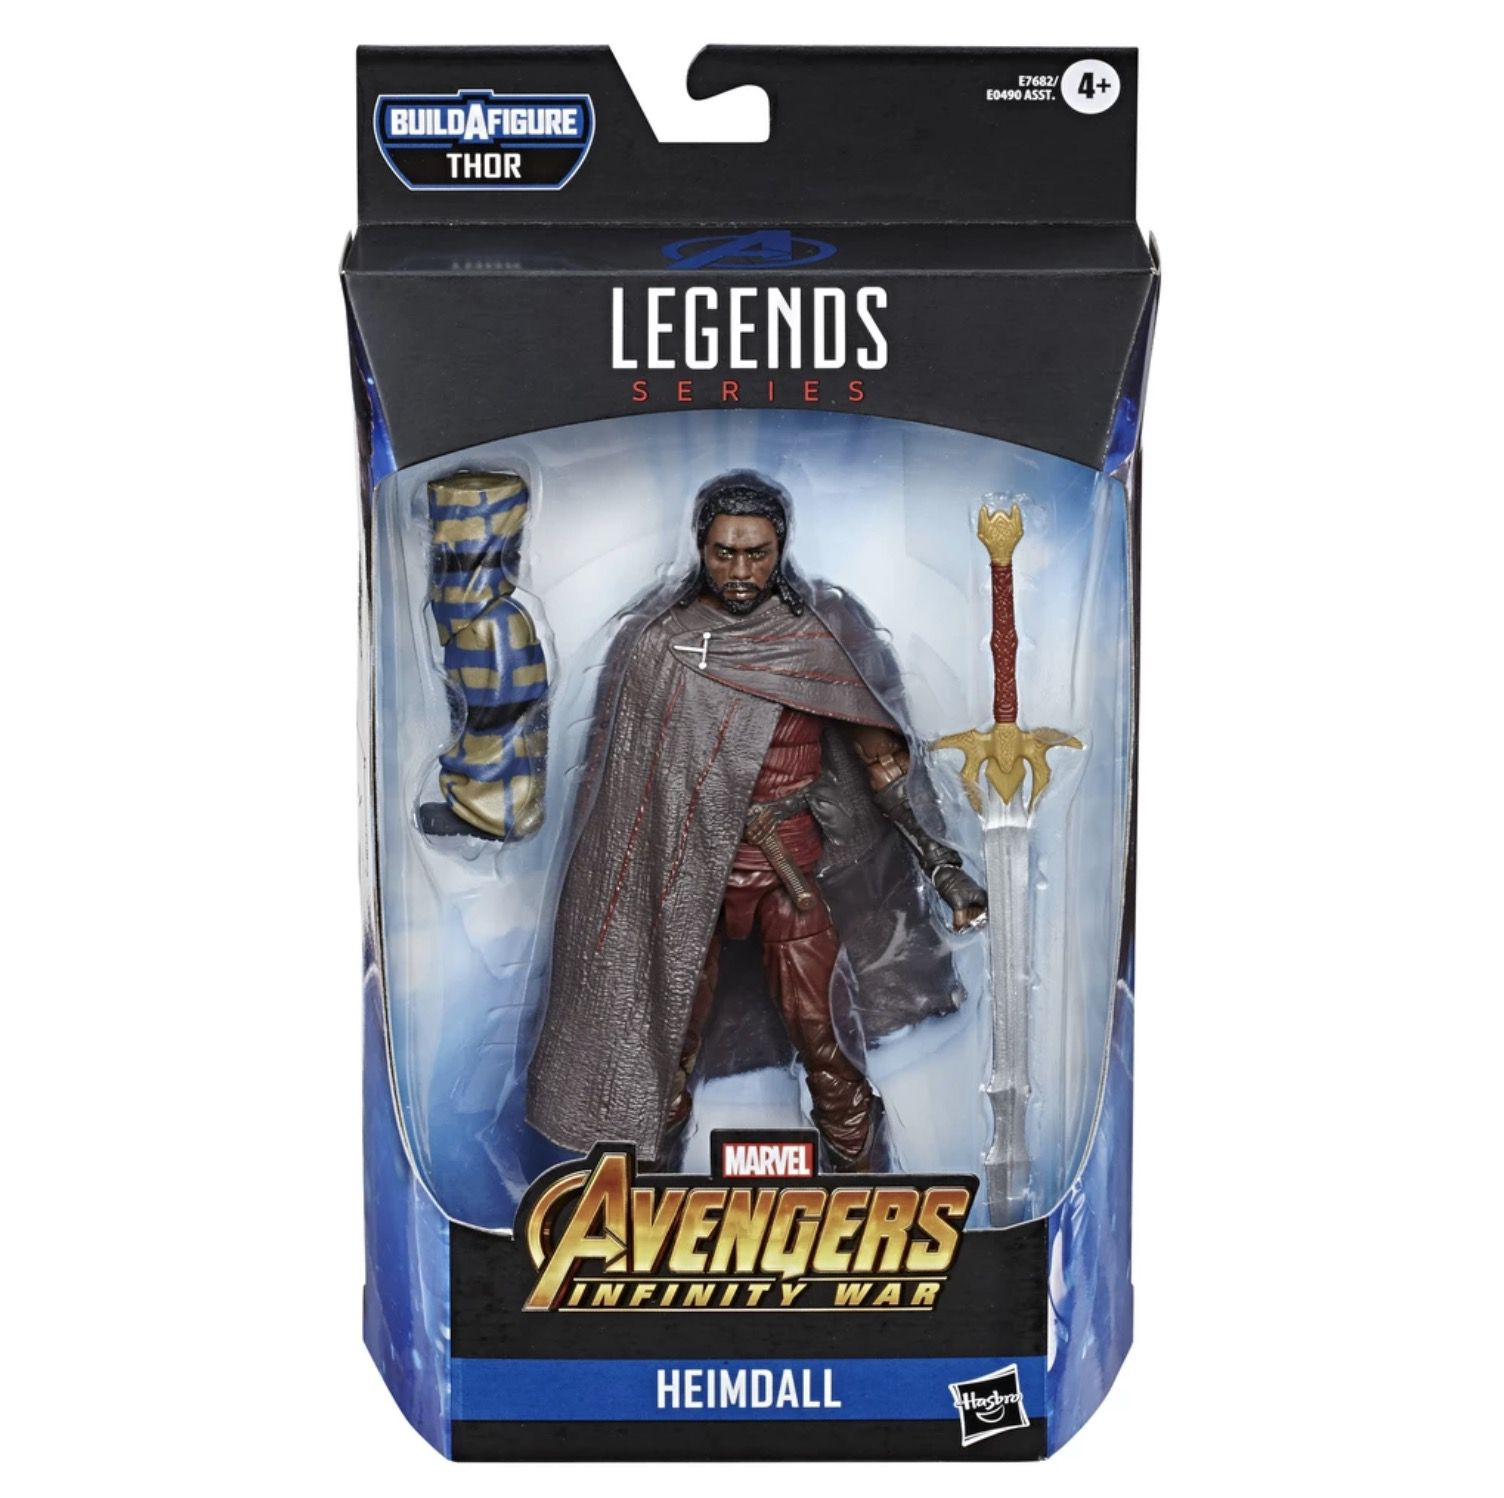 Marvel Legends Series Avengers: Infinity War Heimdall